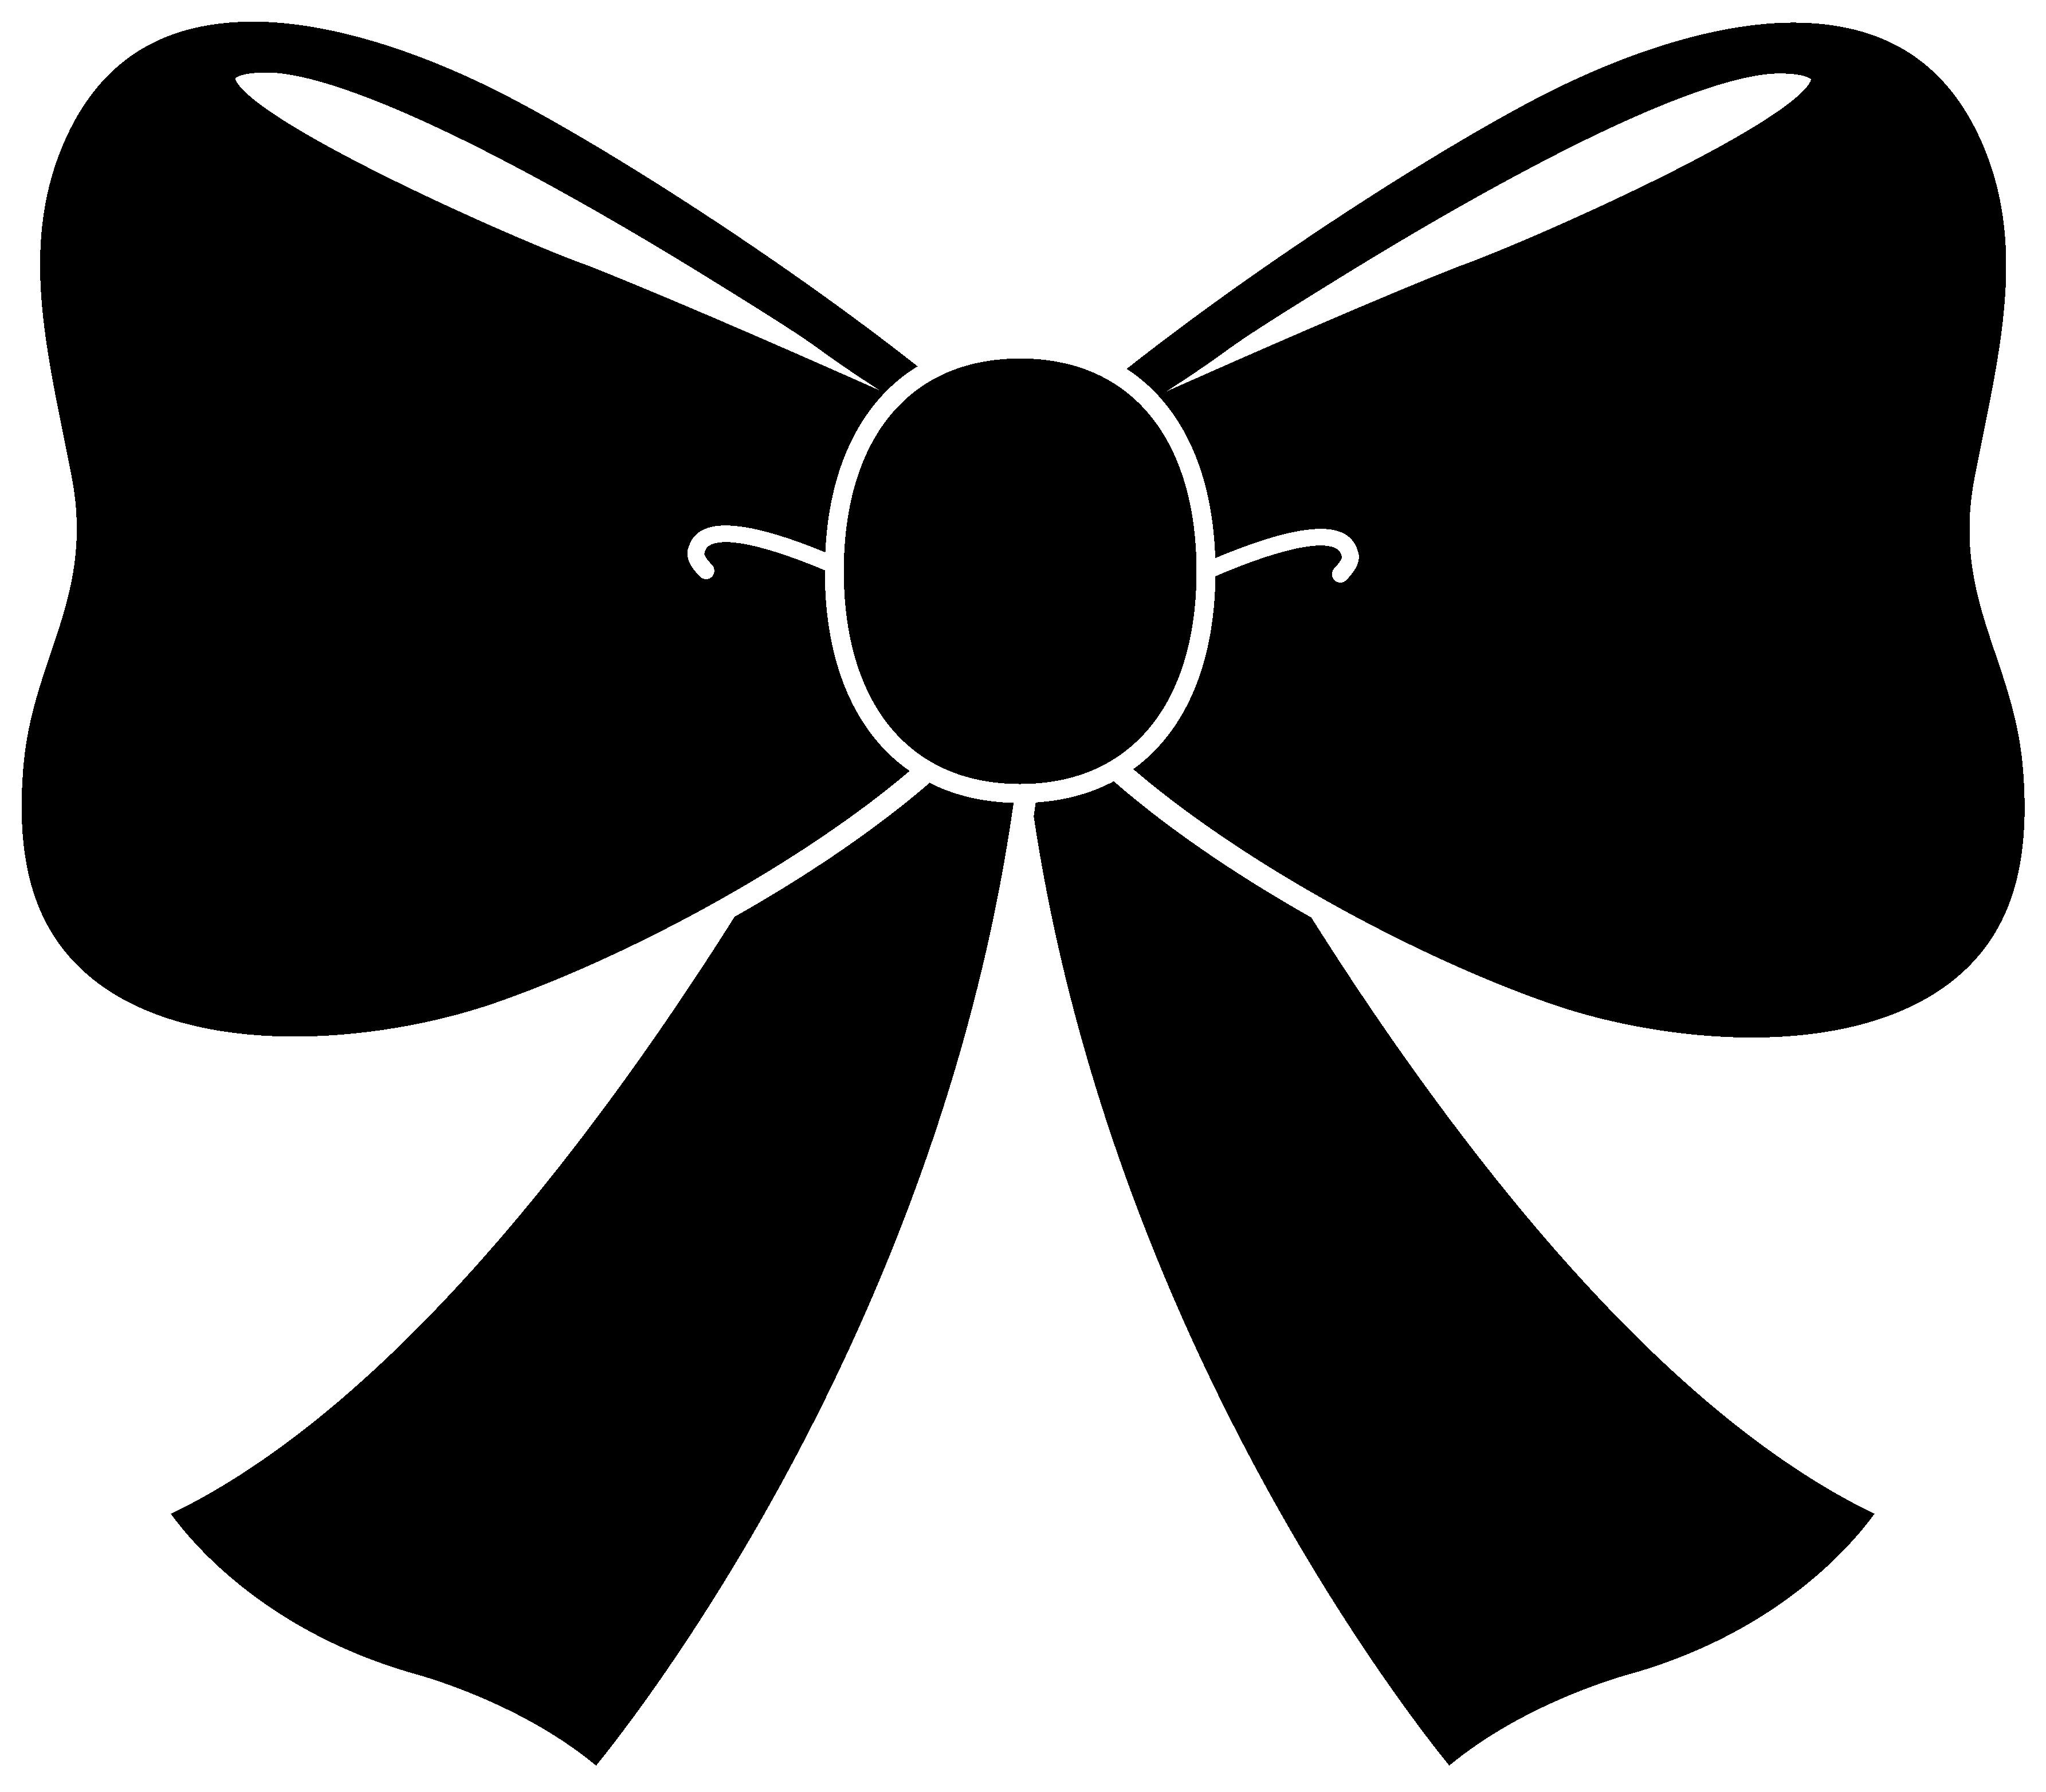 Cute Black Bow Clipart-Cute Black Bow Clipart-8